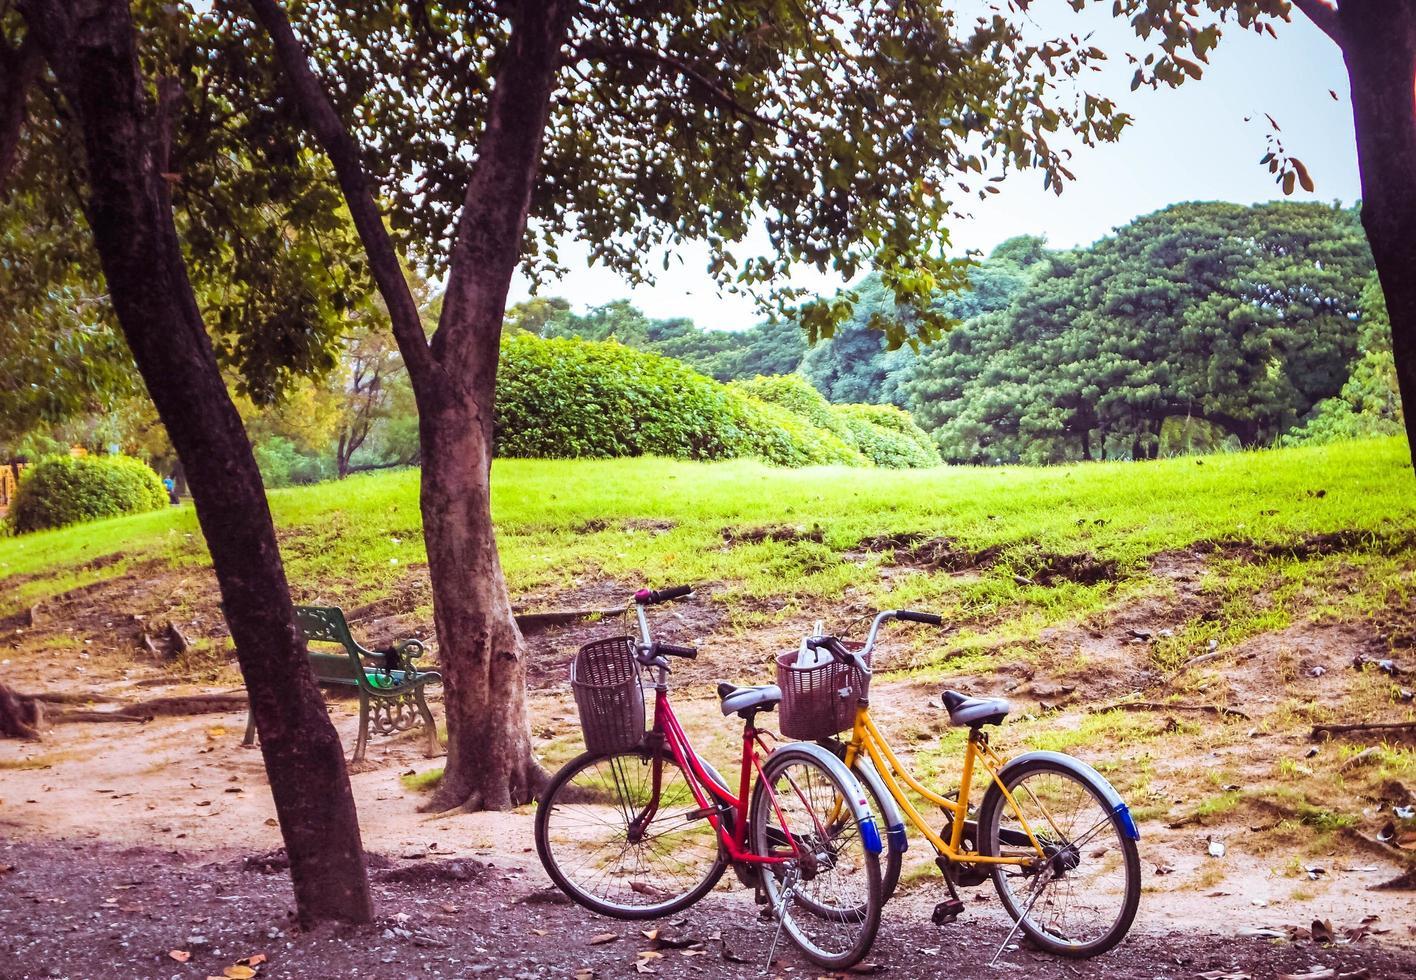 klassisk vintage retro cykelstopp i park foto